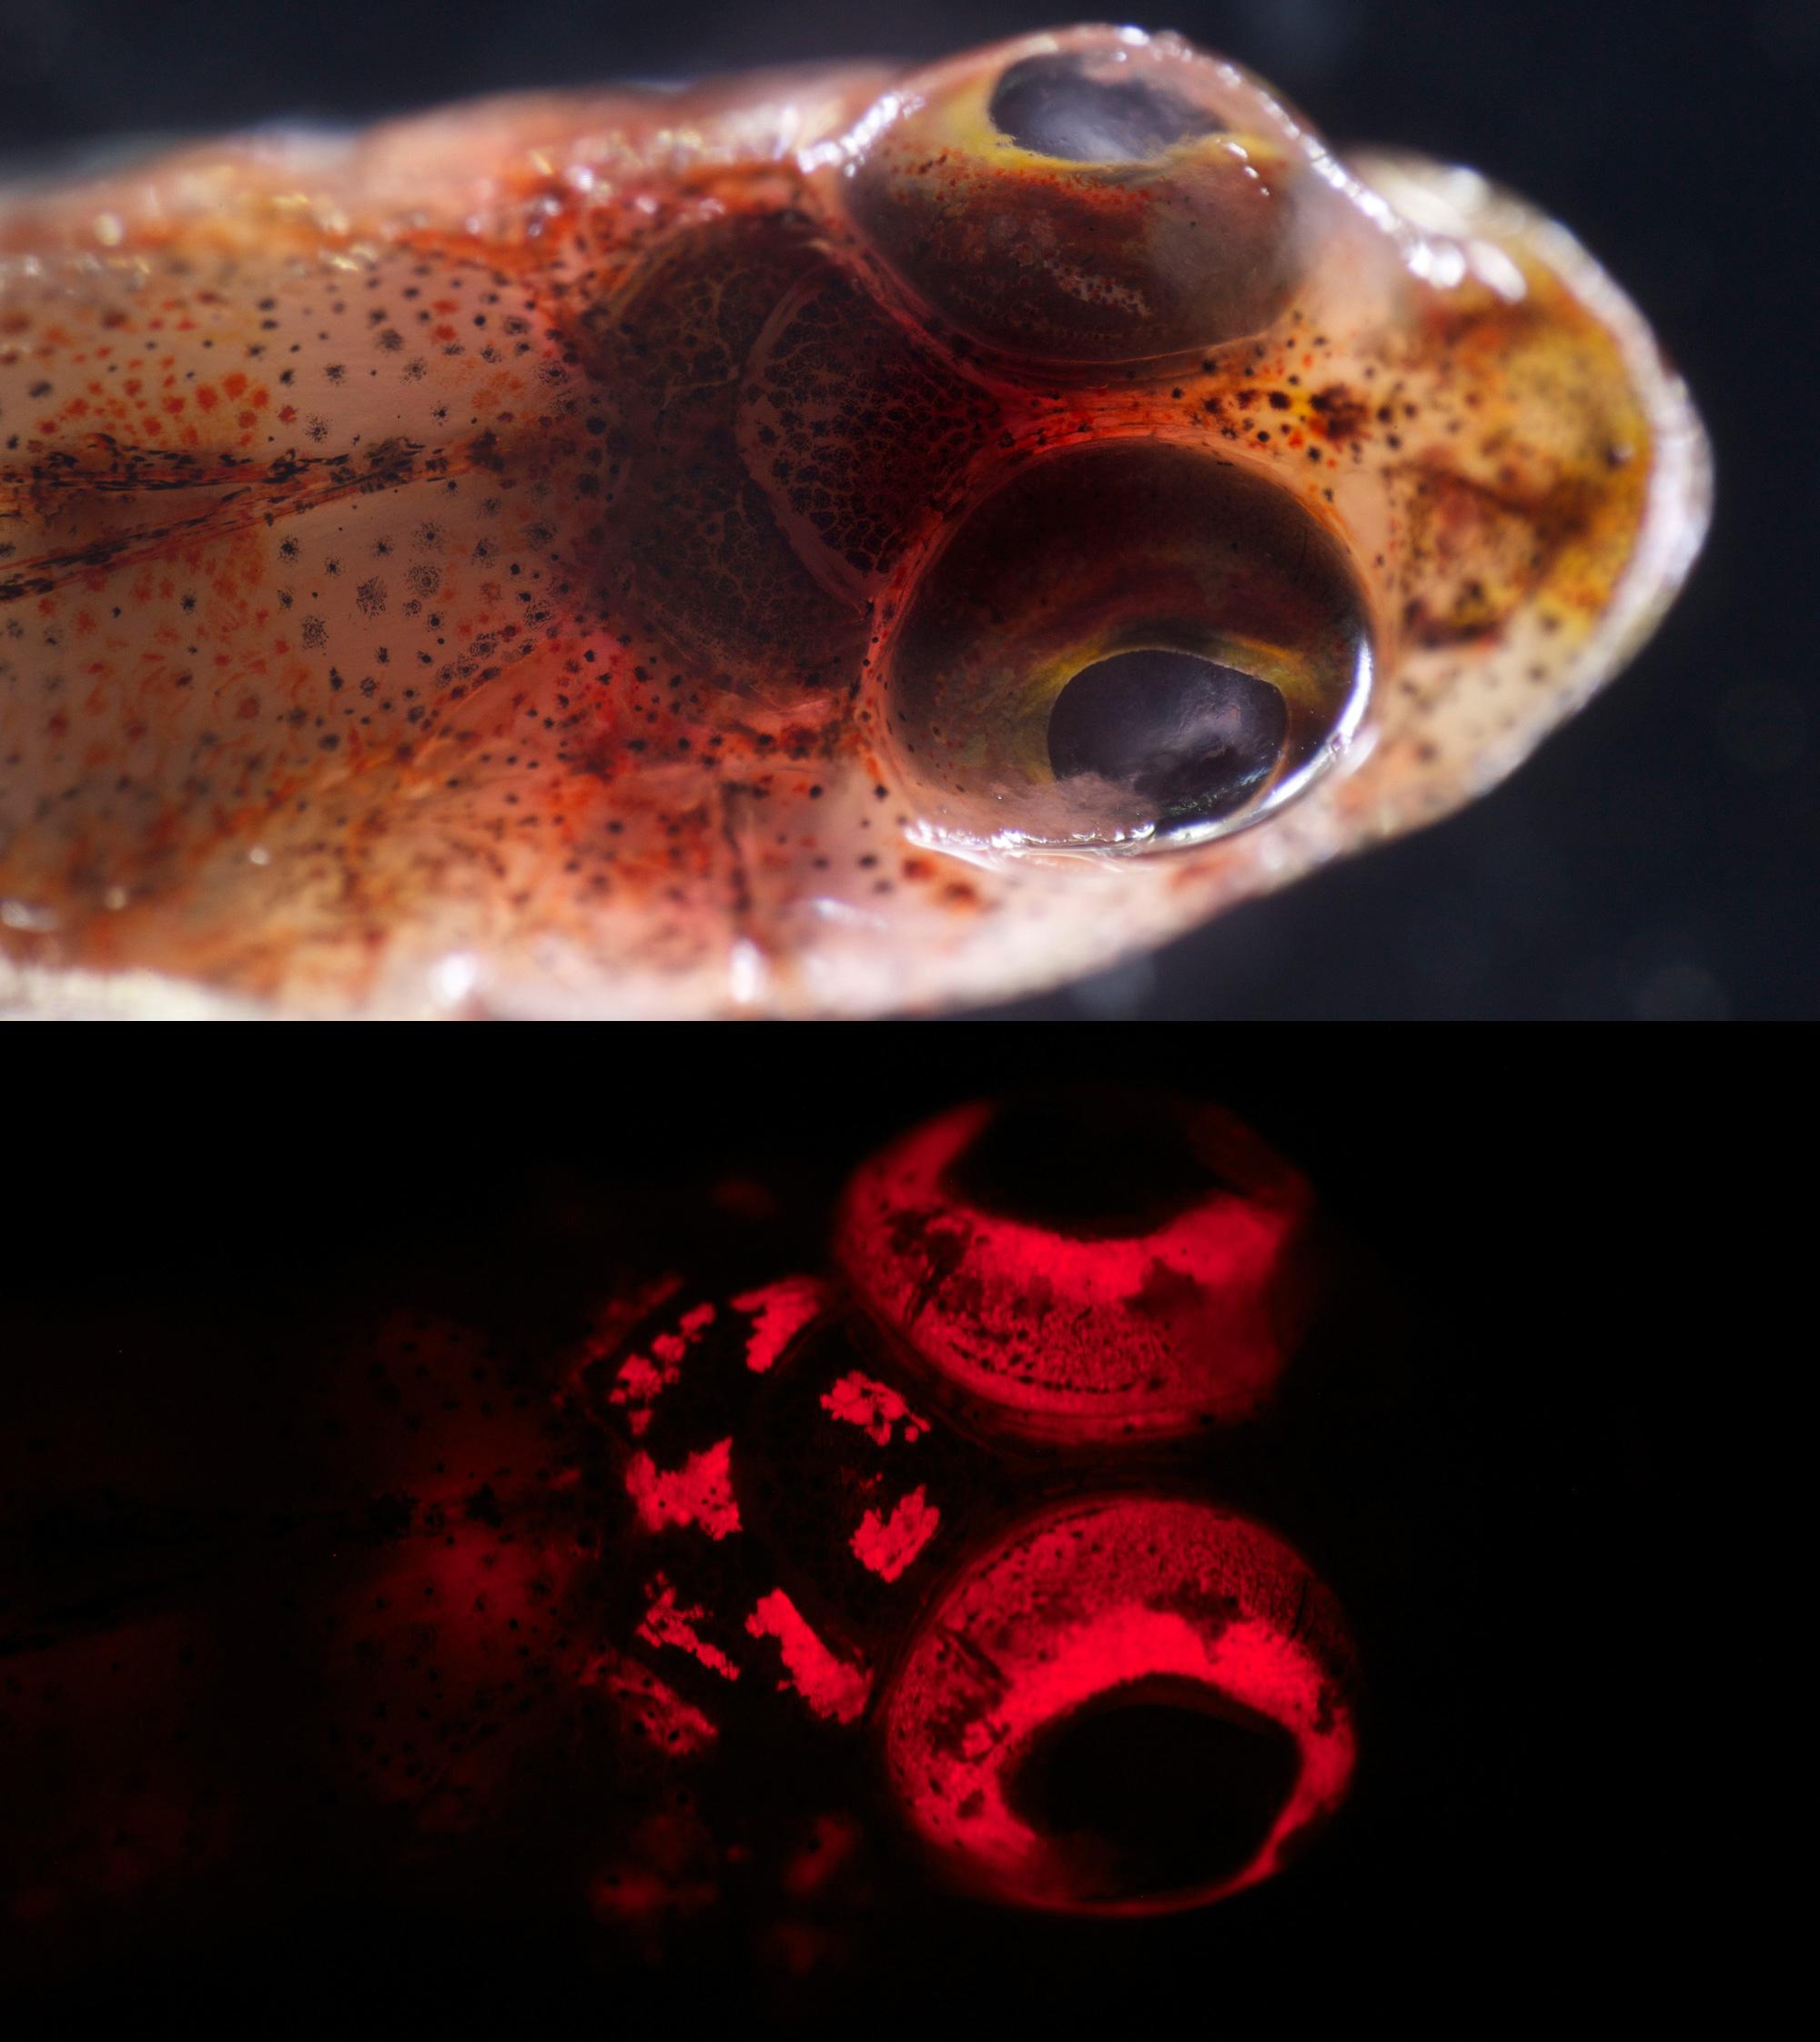 Researchers Reveal Covert World of Fish Biofluorescence